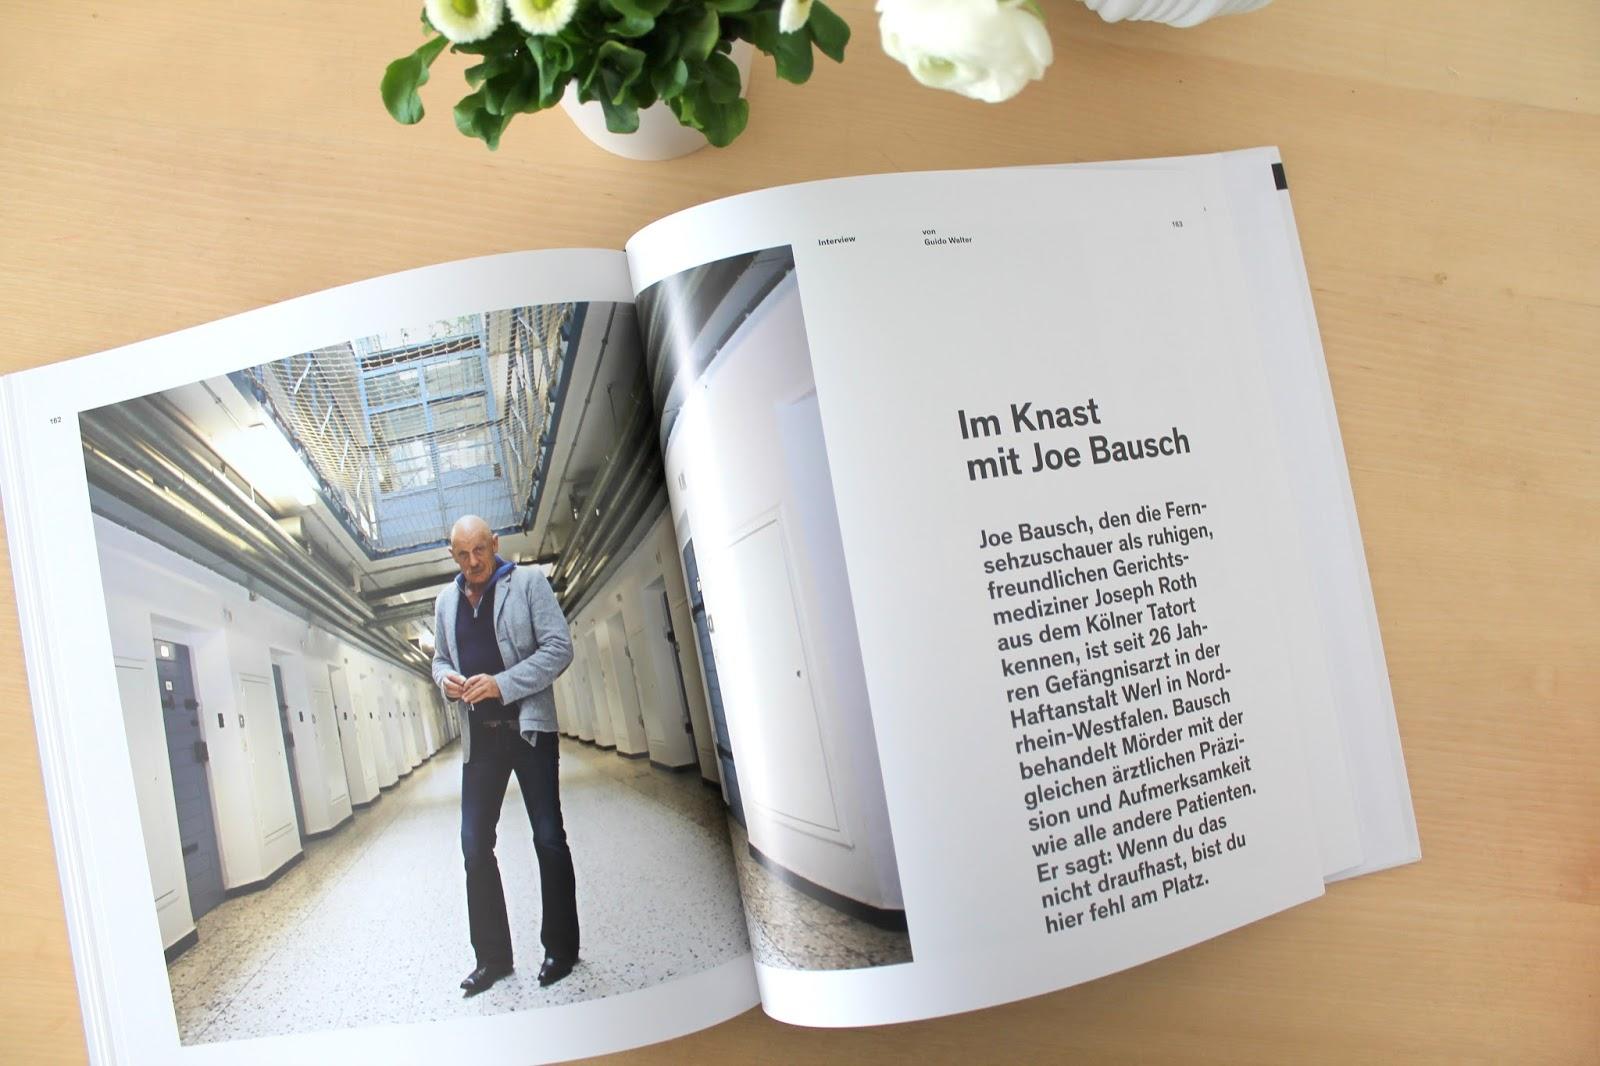 Innenseiten Koelner Tatort Joe Bausch